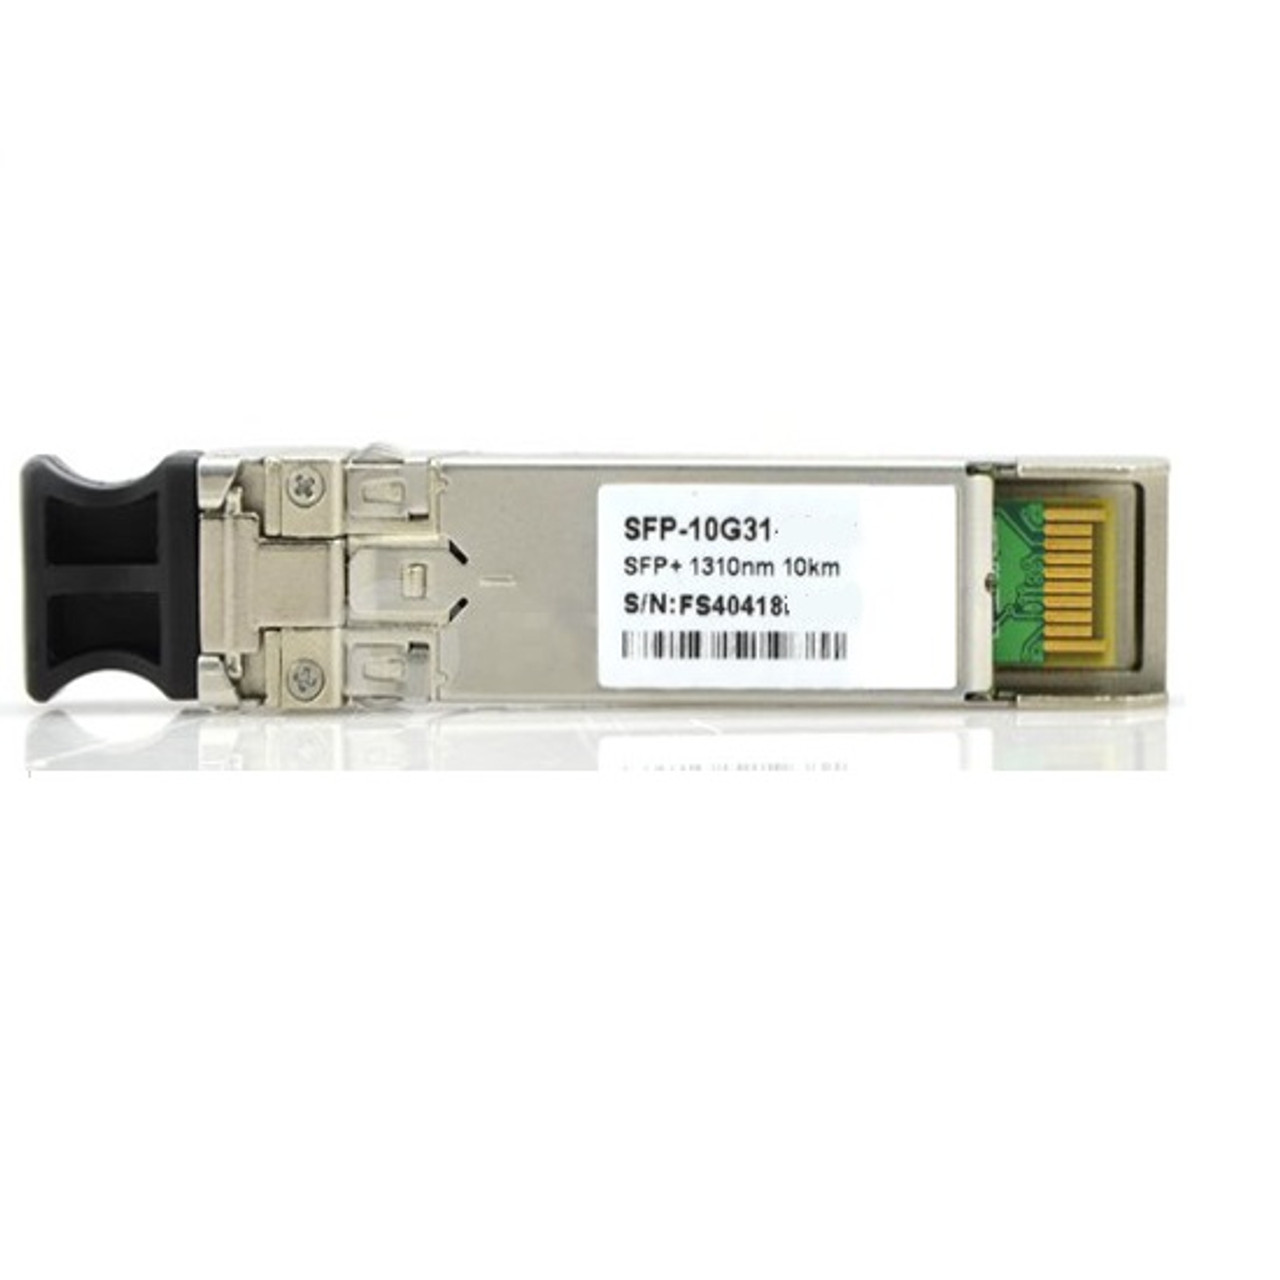 Sealed 850nm 550M Transceiver Module Brand New CISCO 10G-SR 10 GBASE-SR SFP